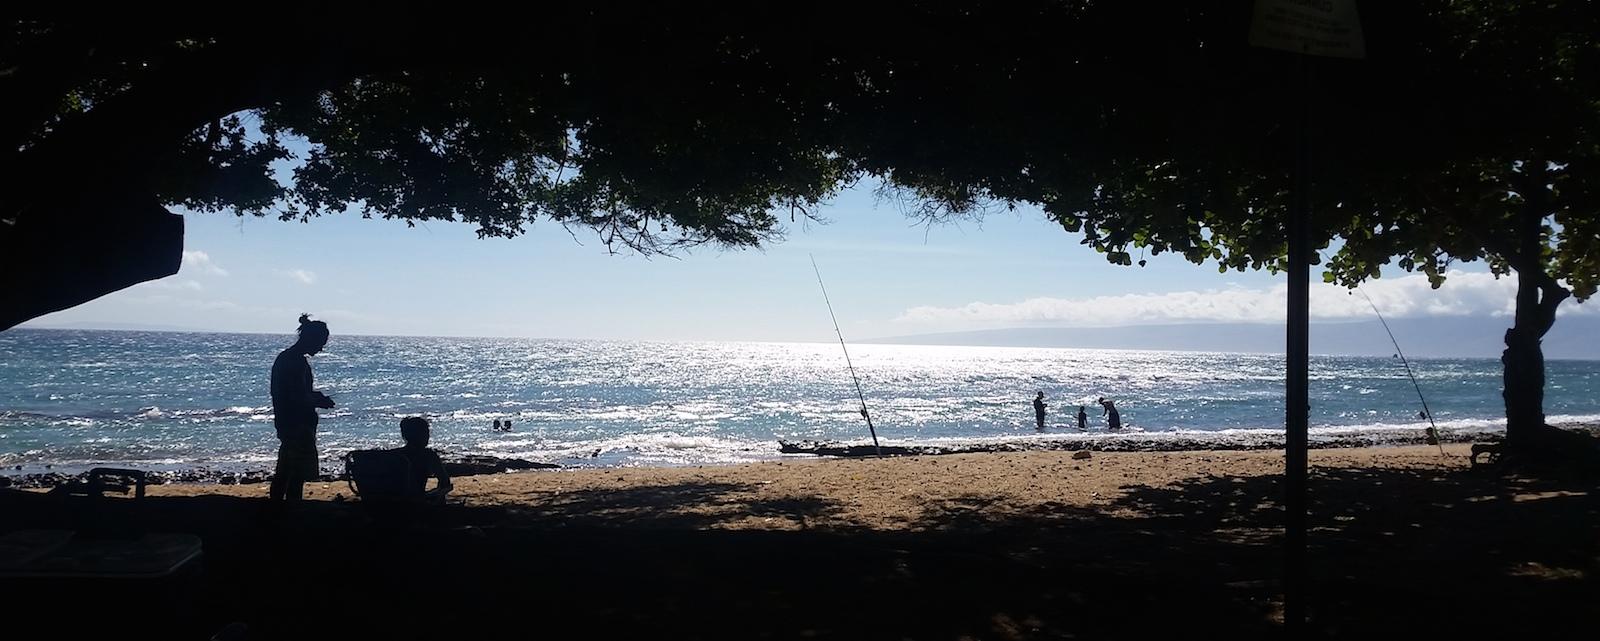 People fishing off a shady beach